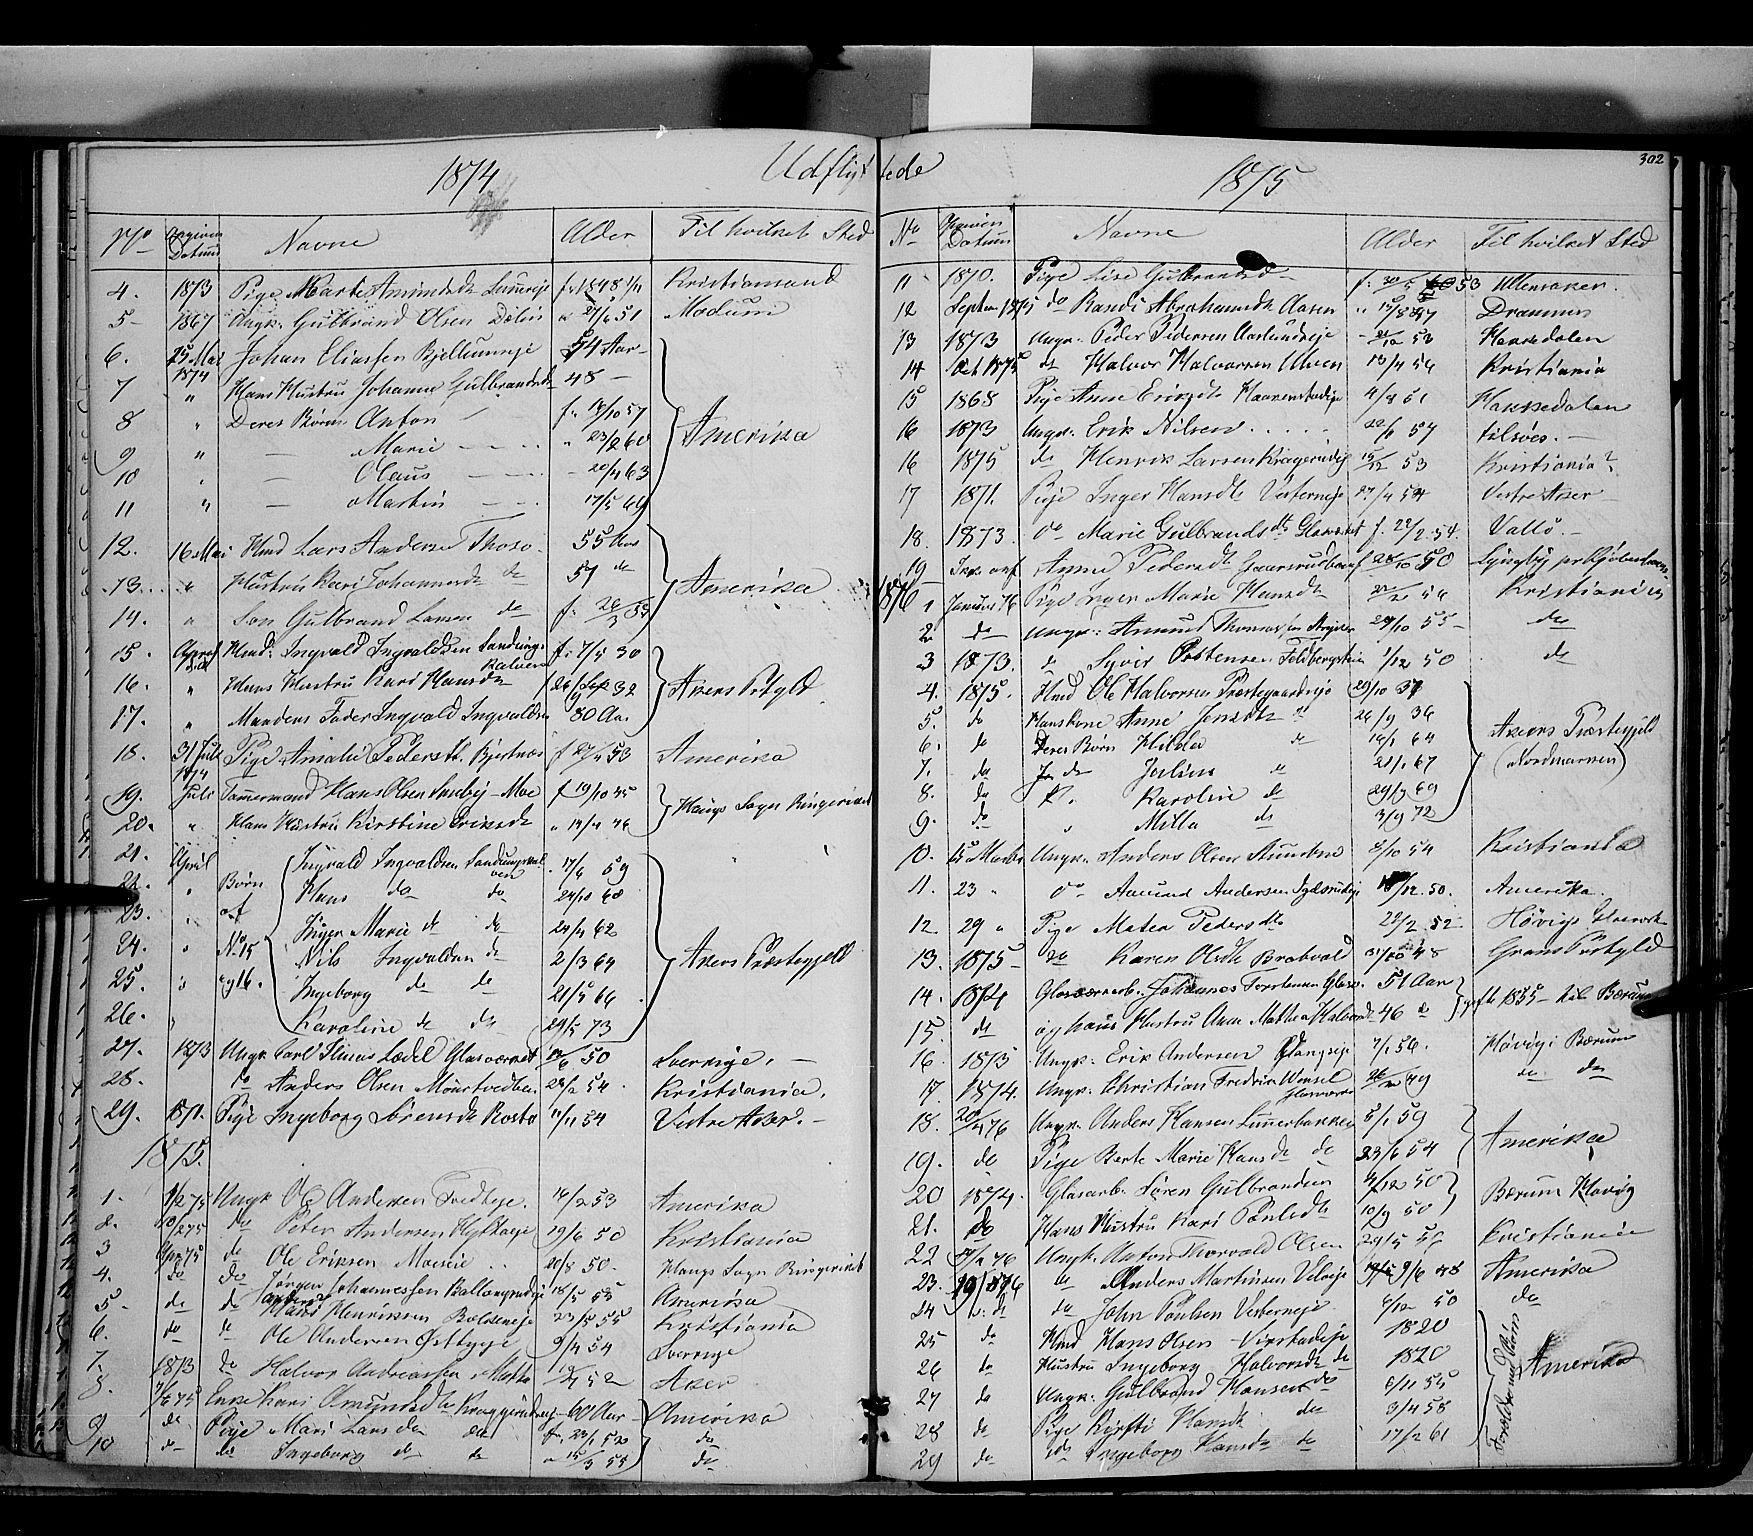 SAH, Jevnaker prestekontor, Ministerialbok nr. 7, 1858-1876, s. 302